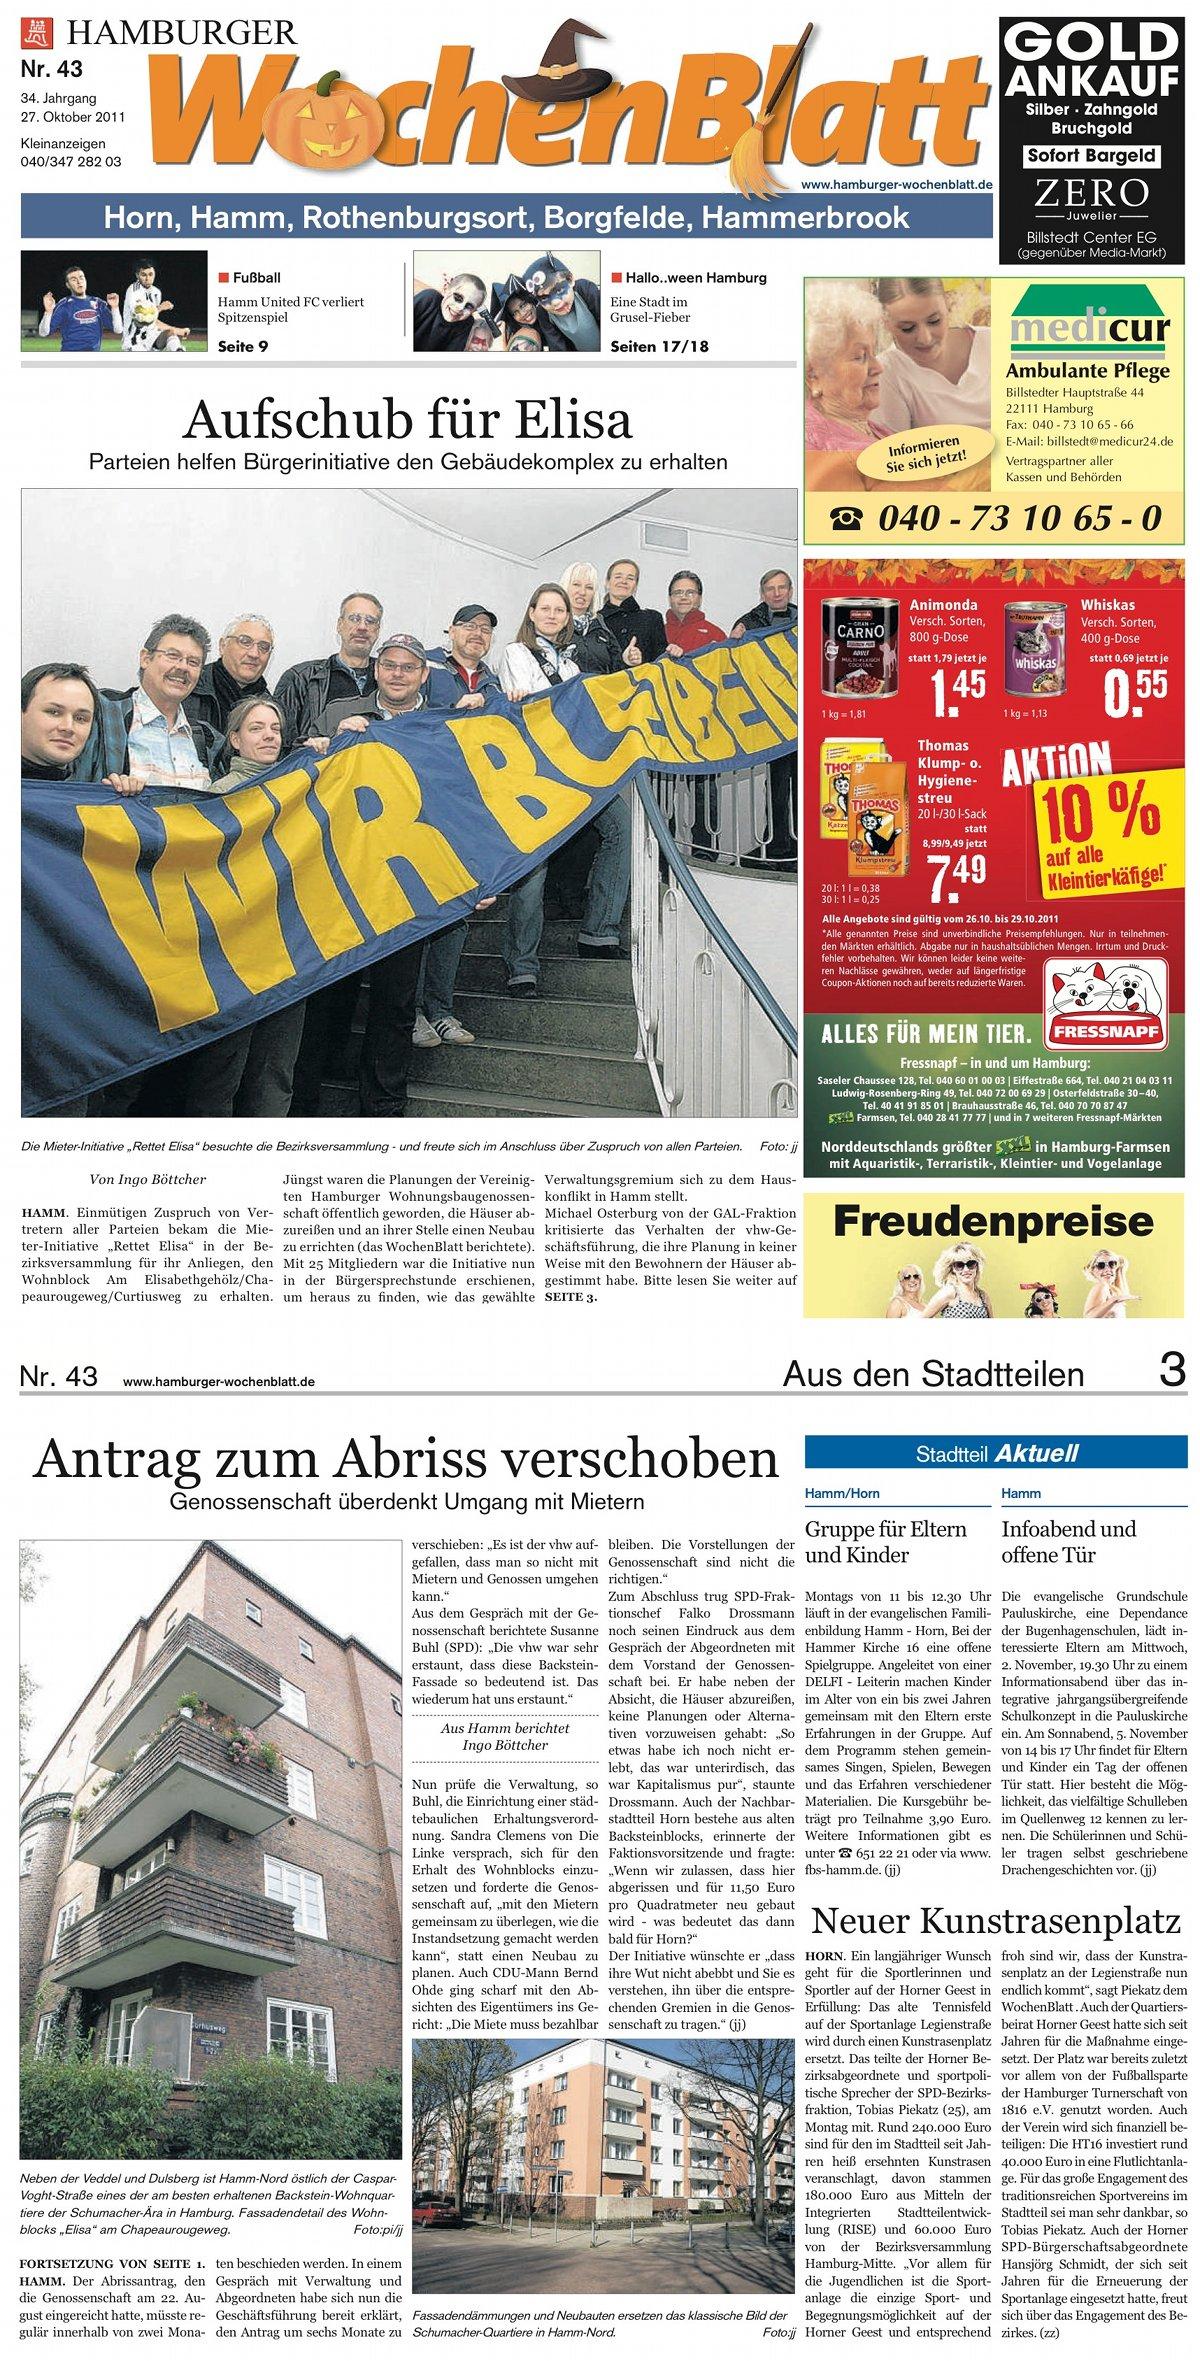 Rettet-Elisa im Wochenblatt KW43